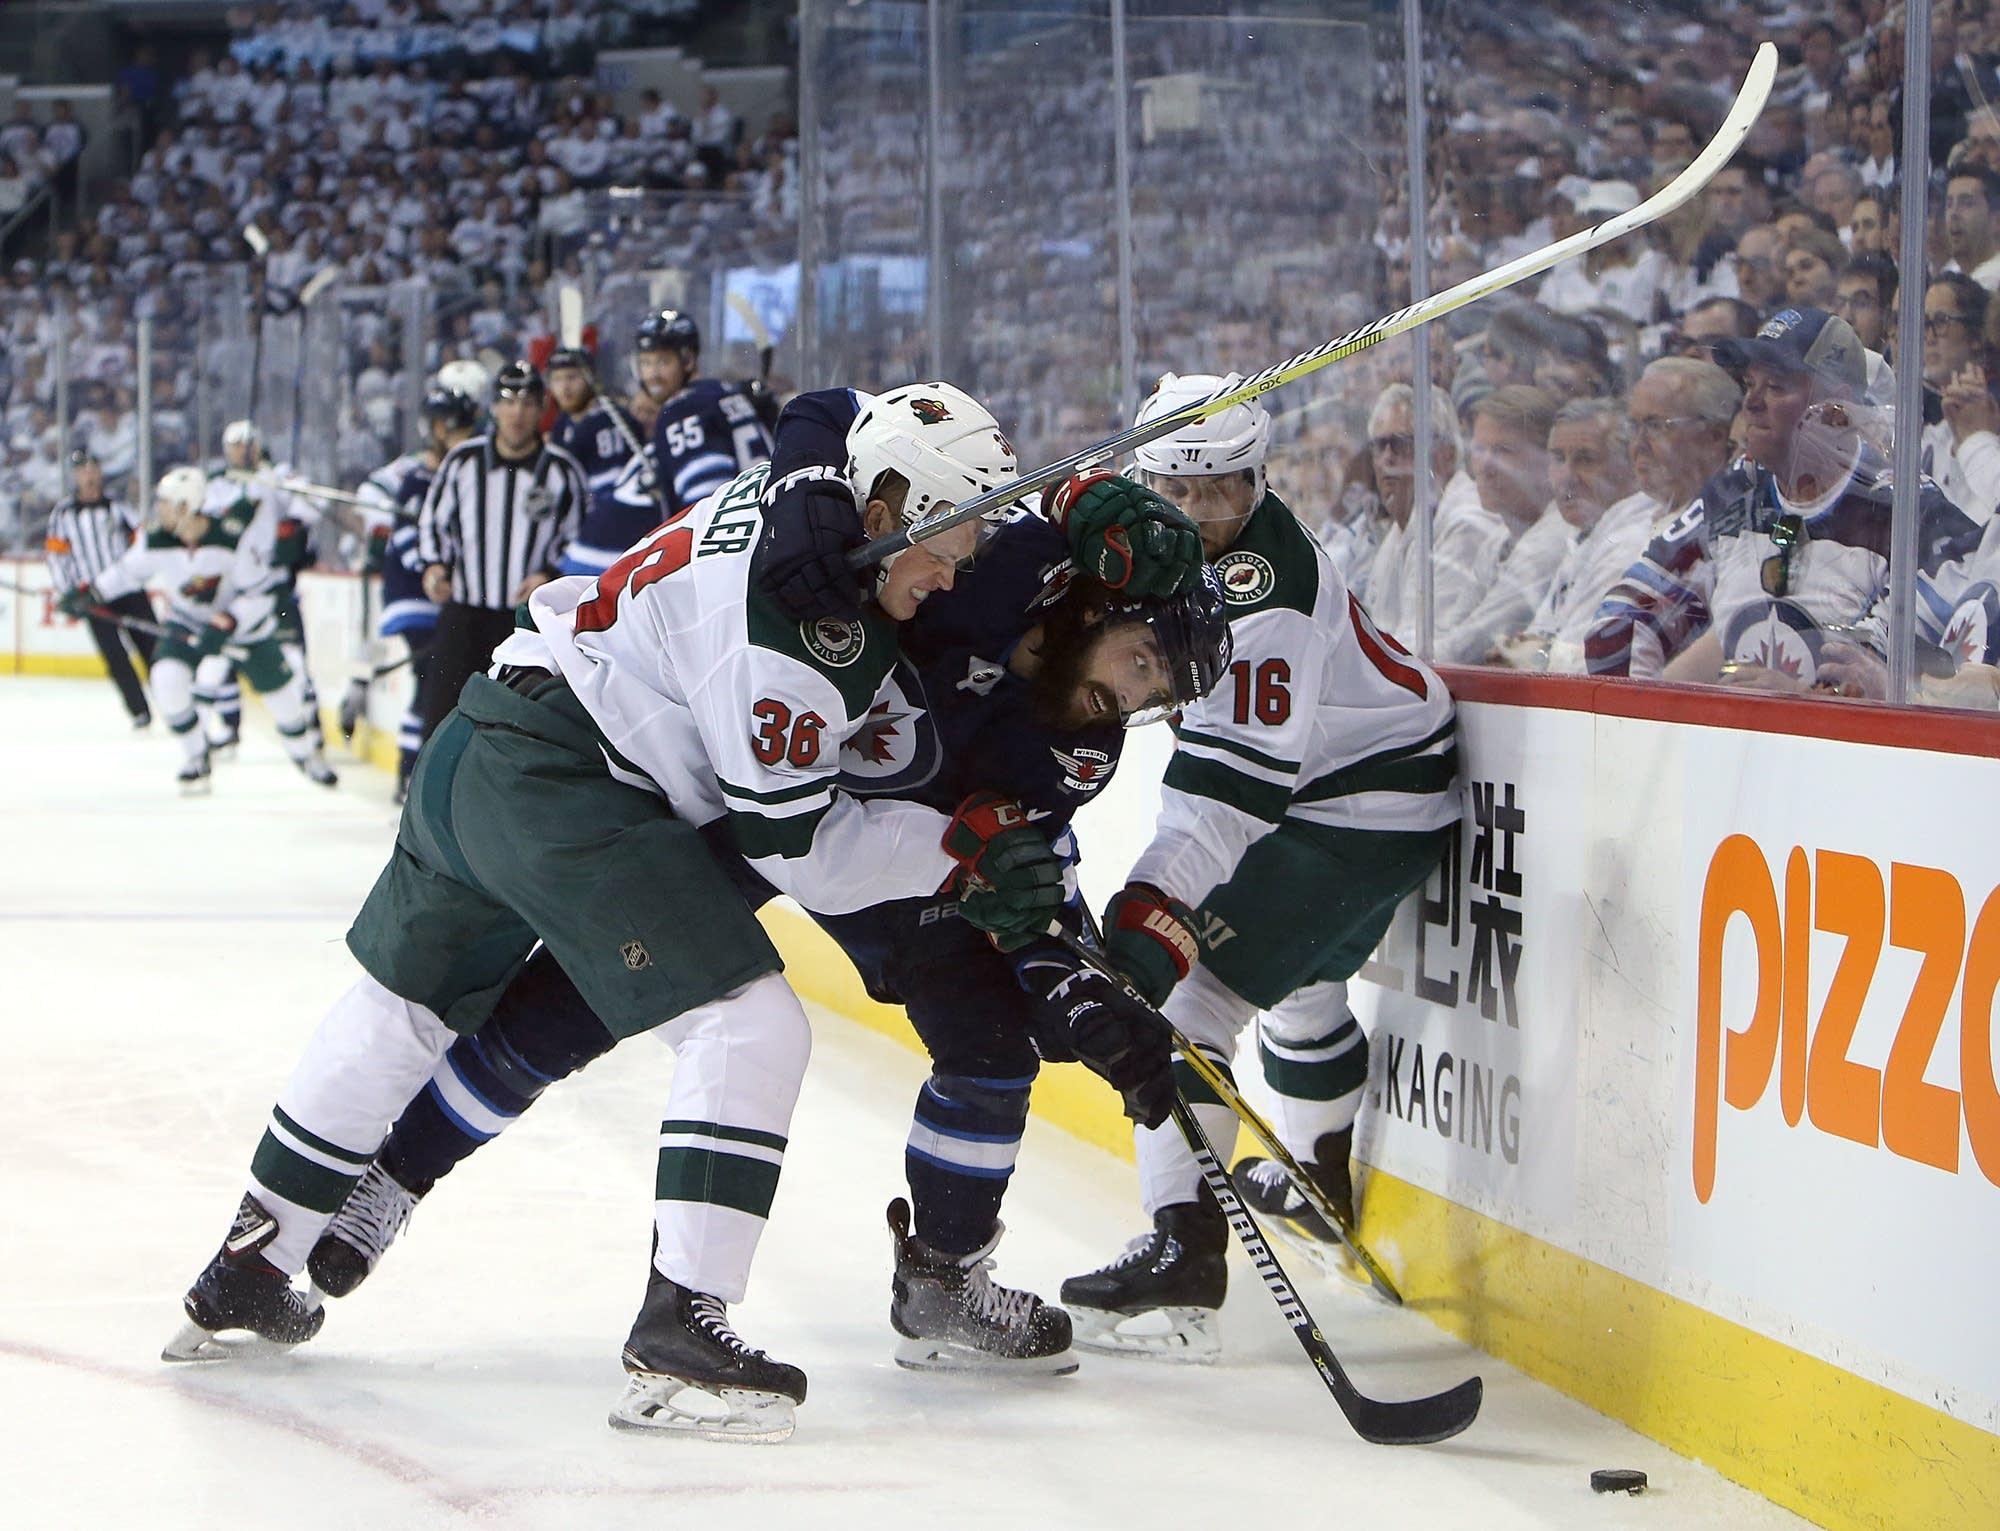 Minnesota Wild vs. Winnipeg Jets, 4-13